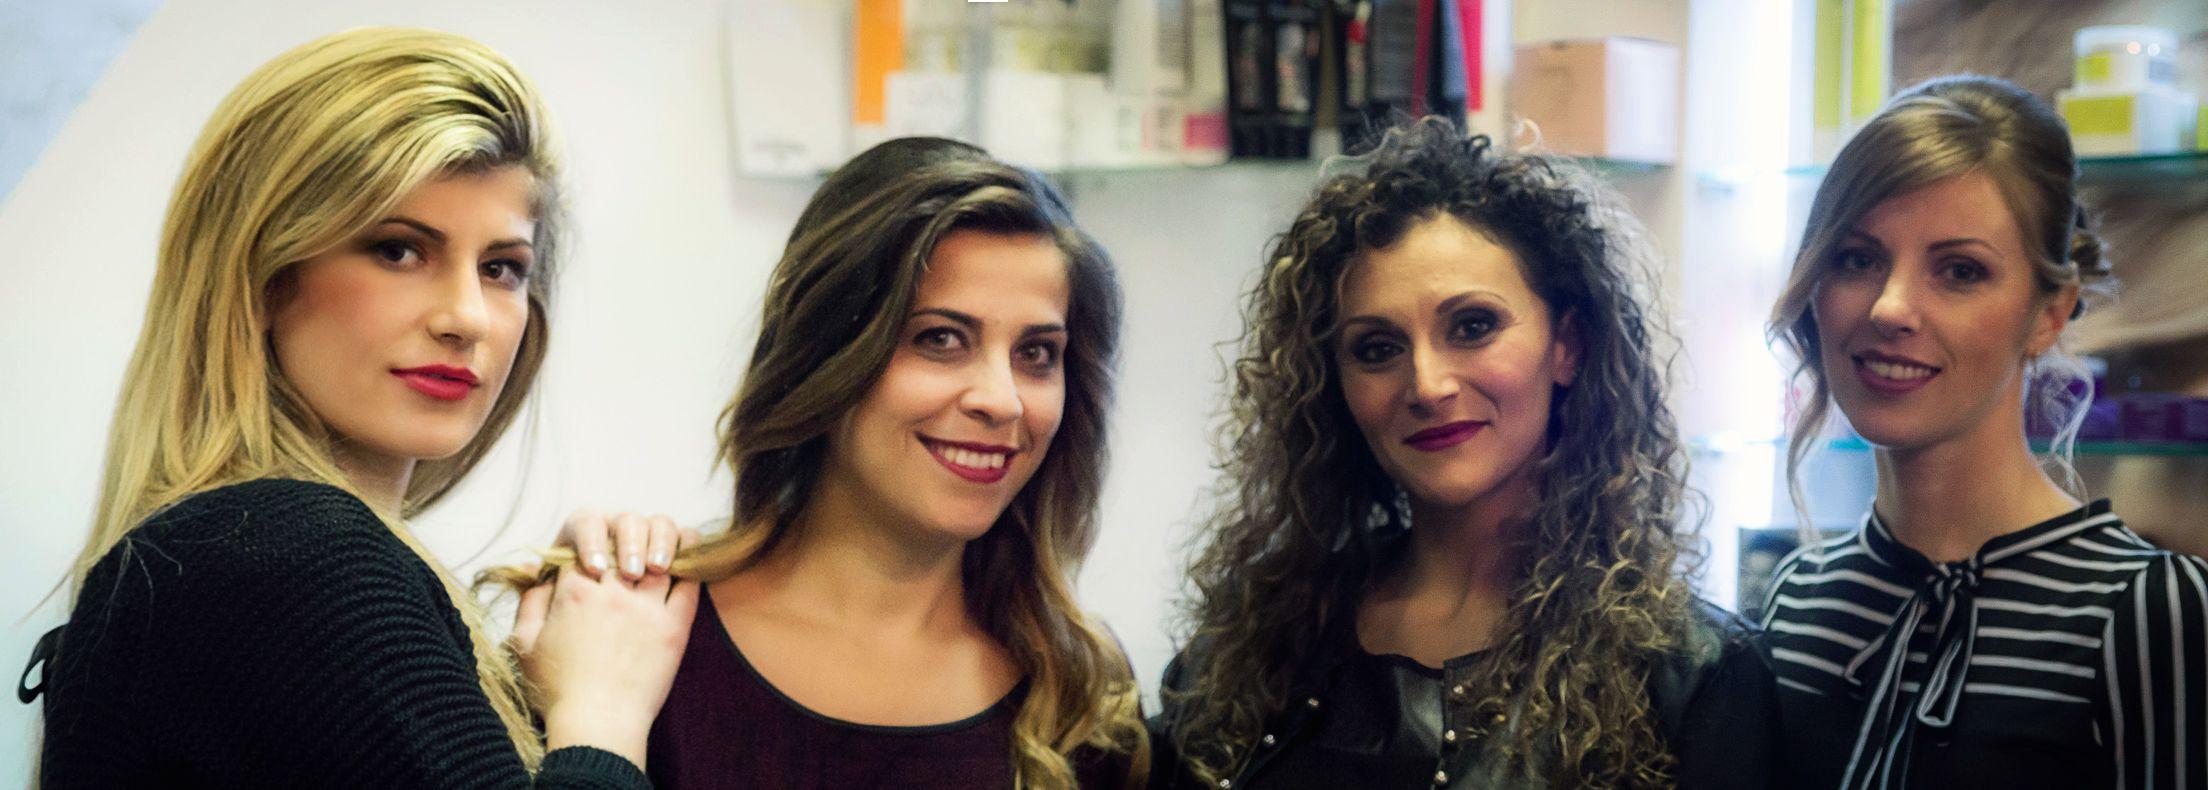 Ilda Beauty Salon